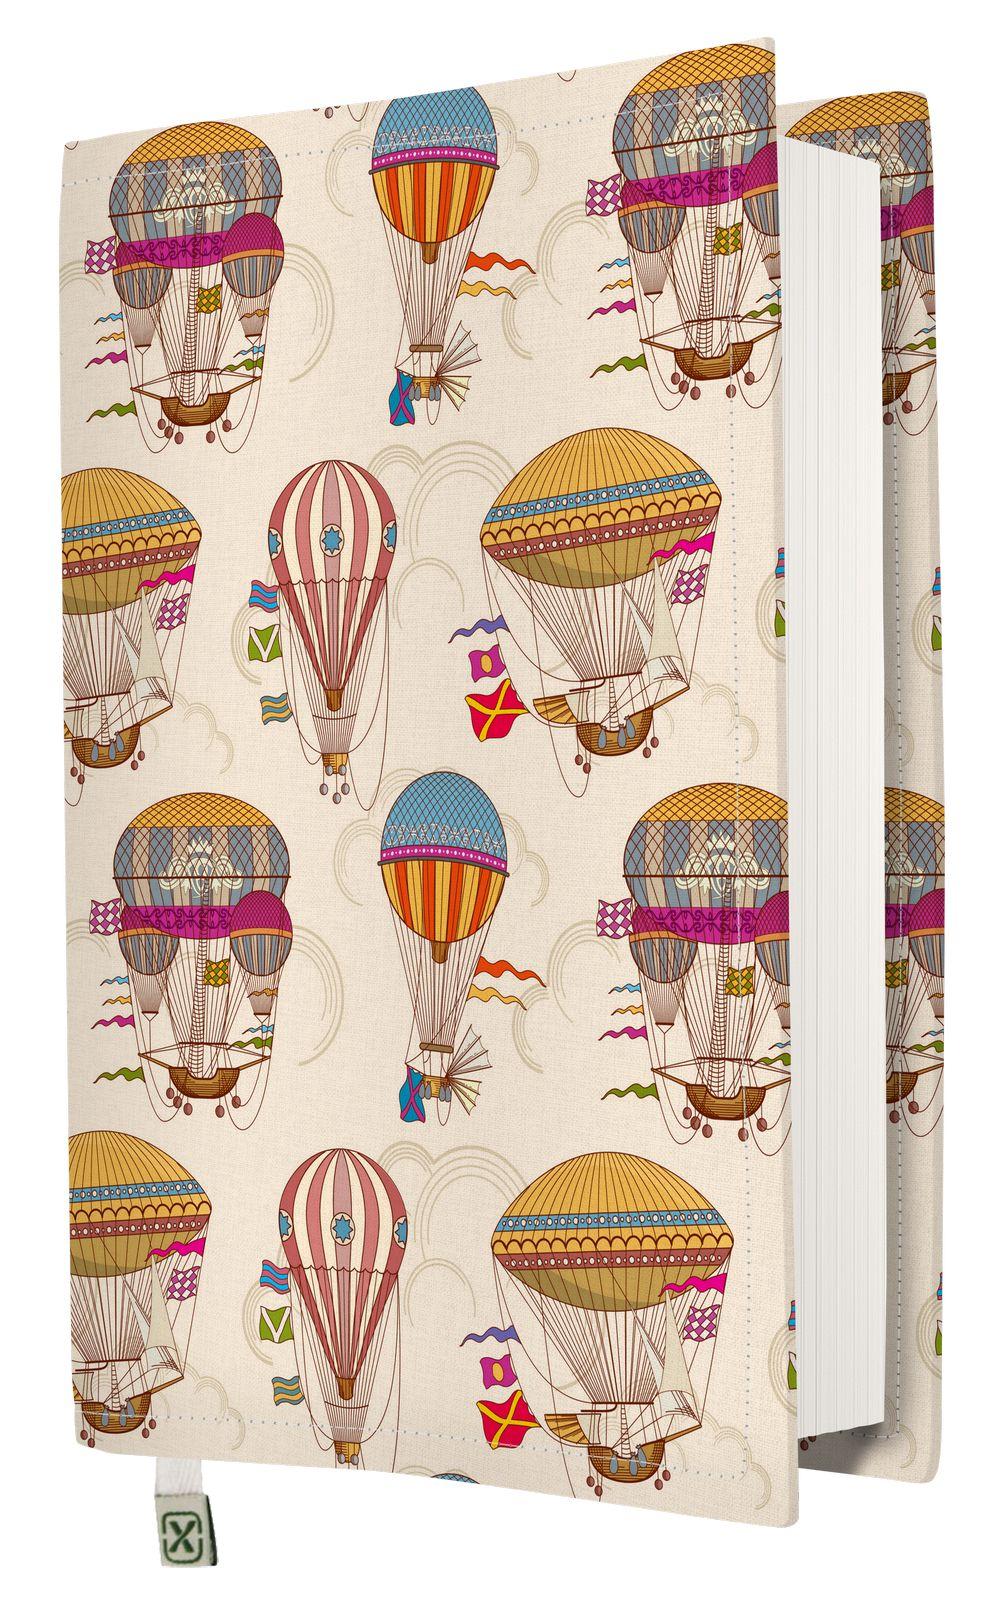 Kapax Kitap Kılıfı - Balonlar - M - 31x21cm